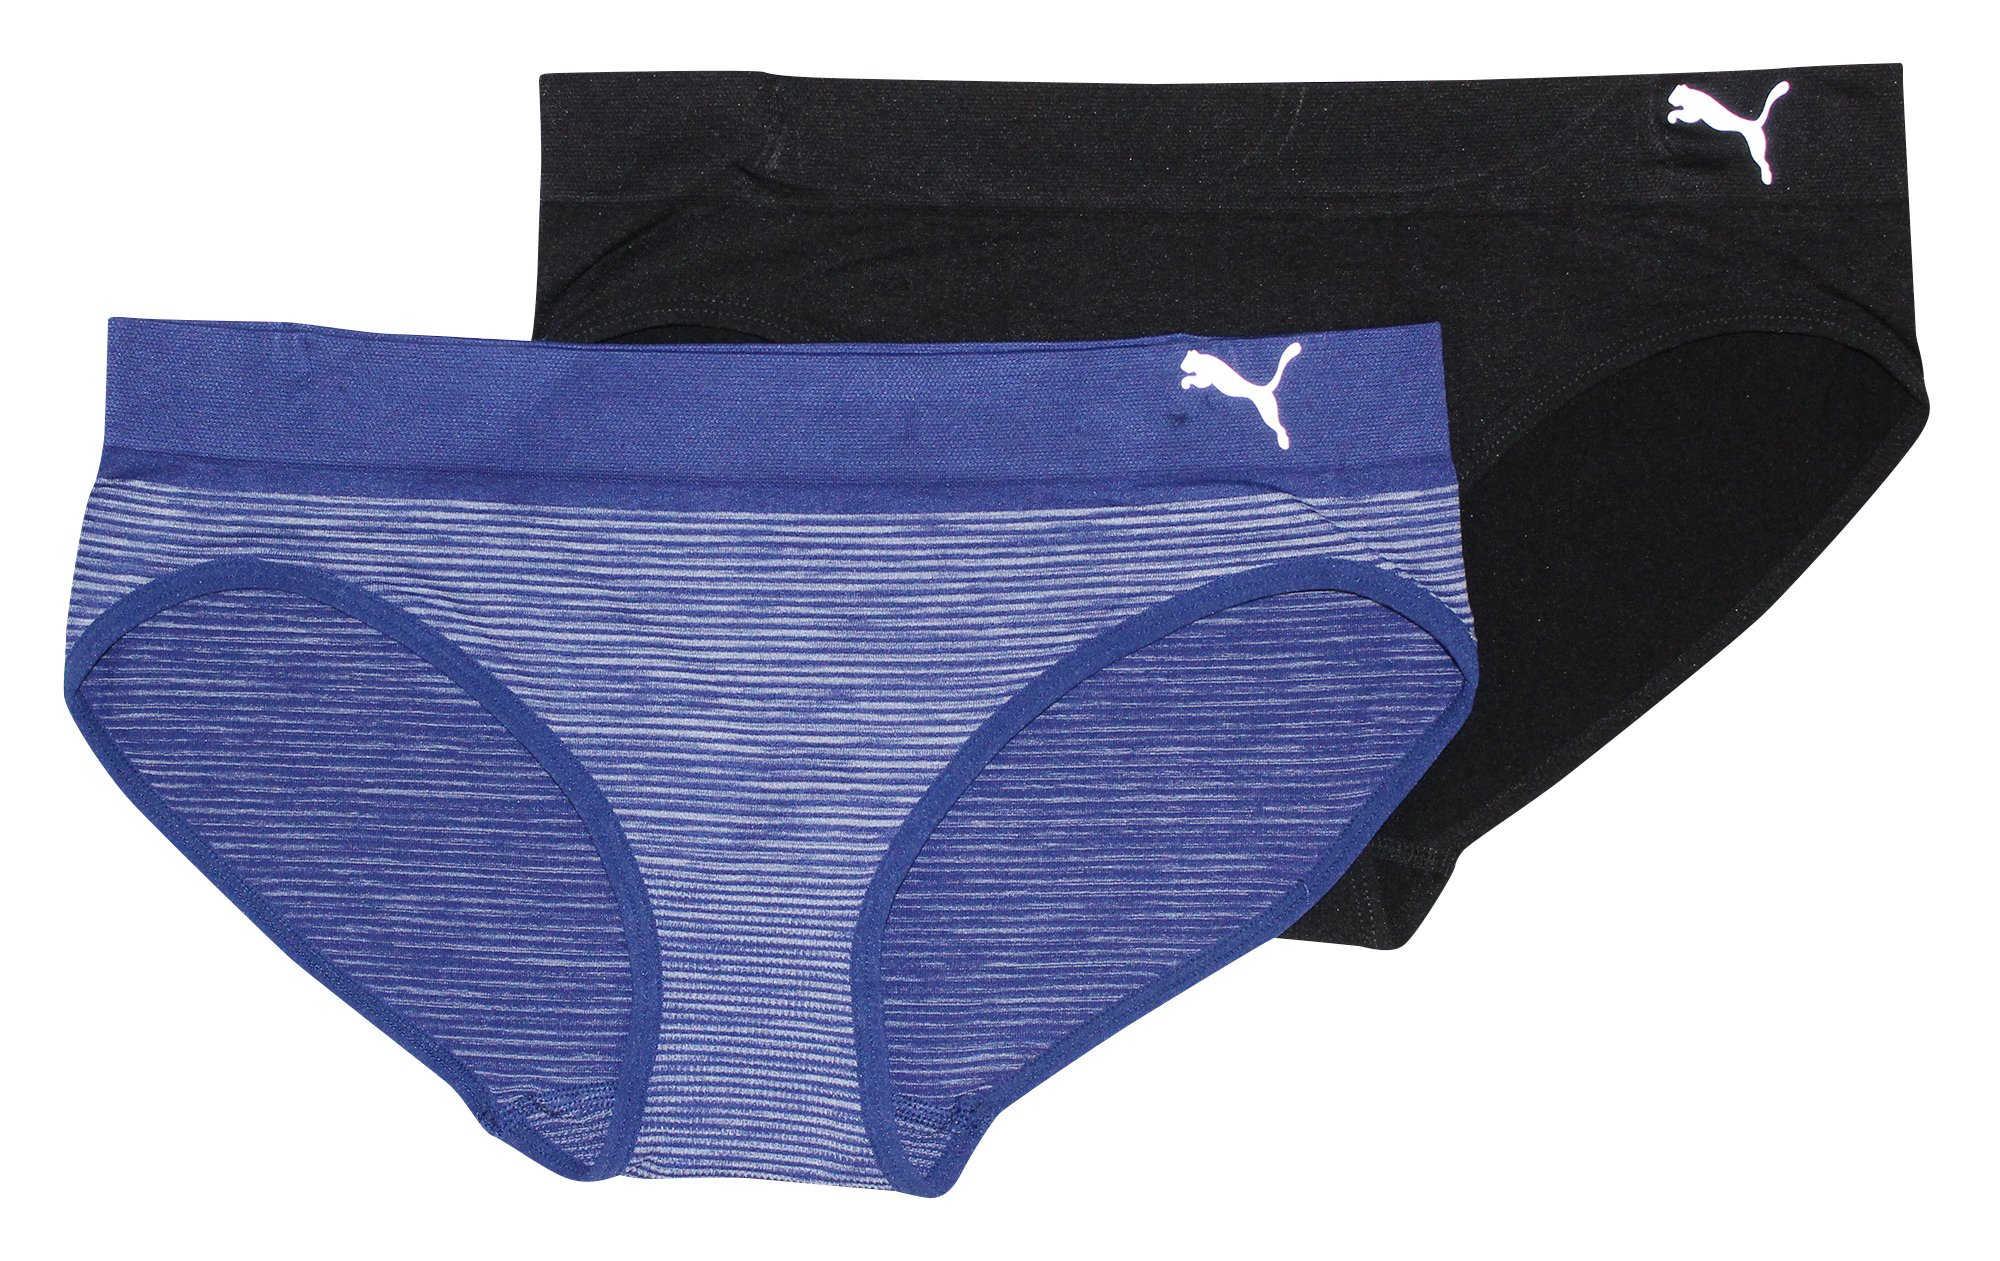 Puma Women's 2-Pack Seamless Super Soft Sport Stretch Bikini Panty, Navy, Large